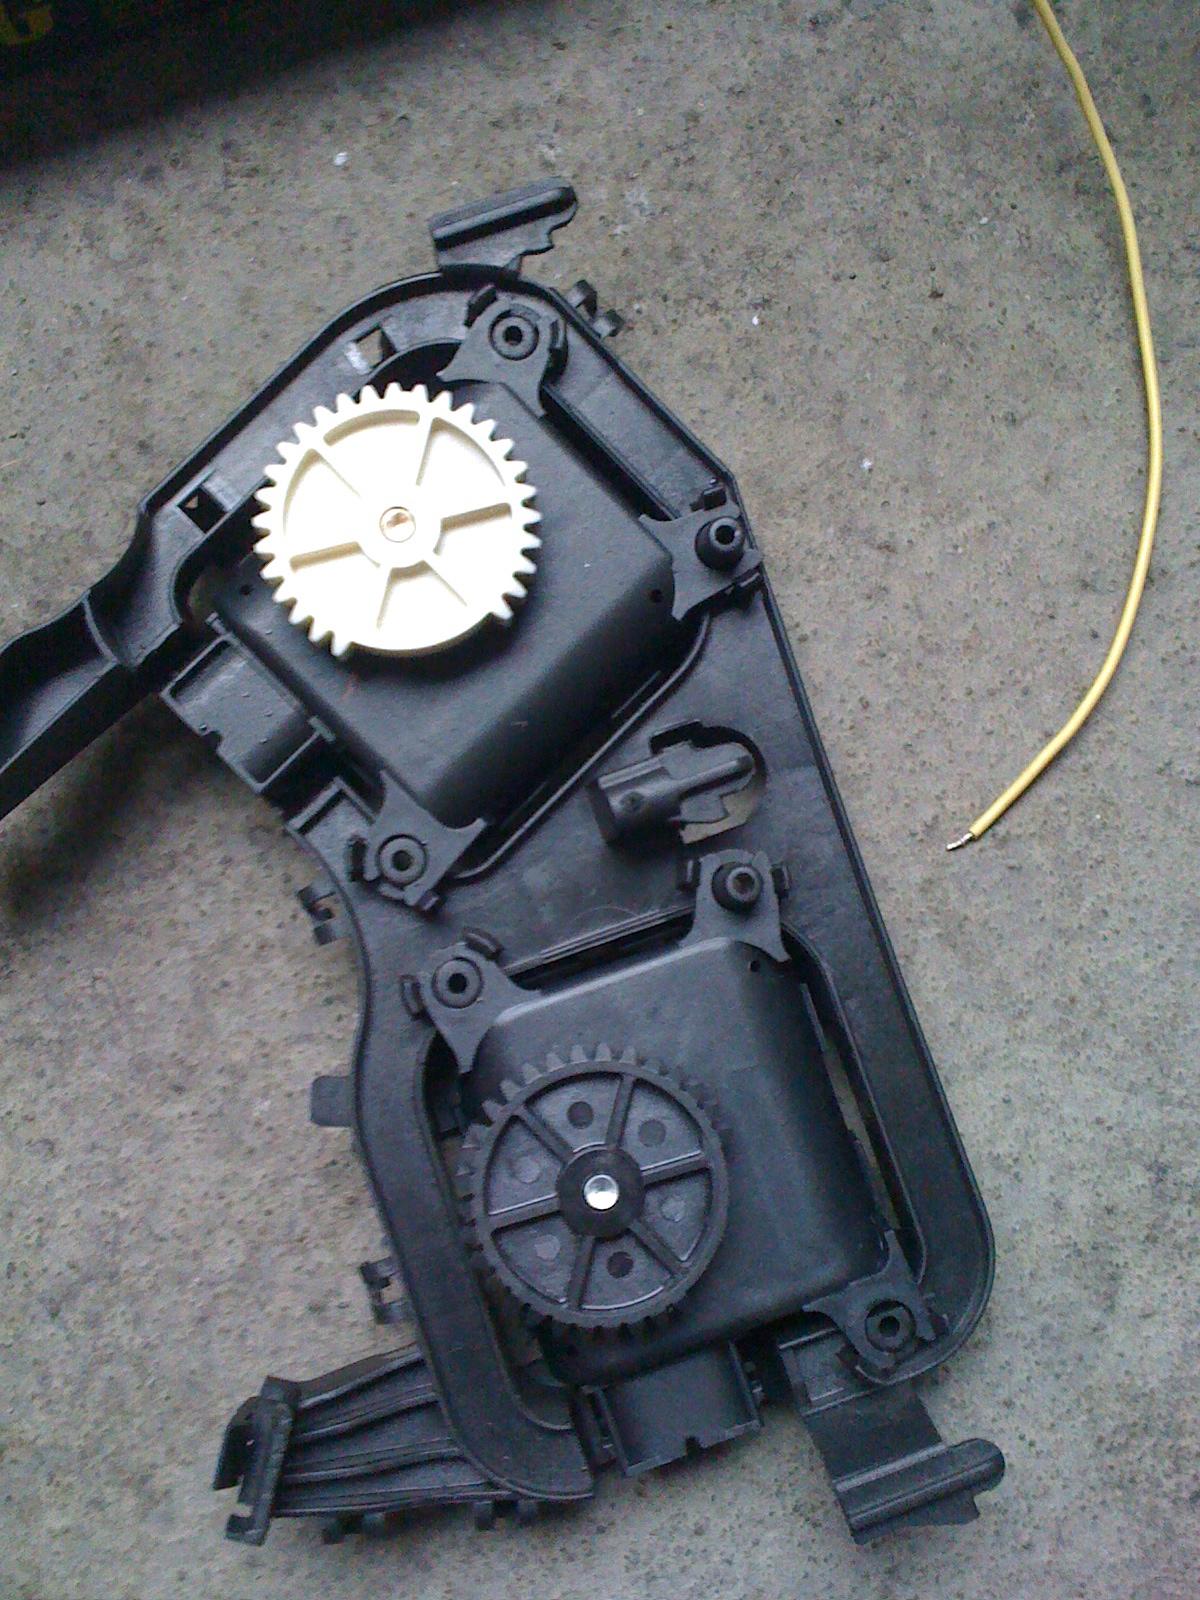 58933a5d5ccf9_StellmotorenDefrosteruTemperaturklappe.jpg.953986dbcbc460cd6485304a0e395db9.jpg